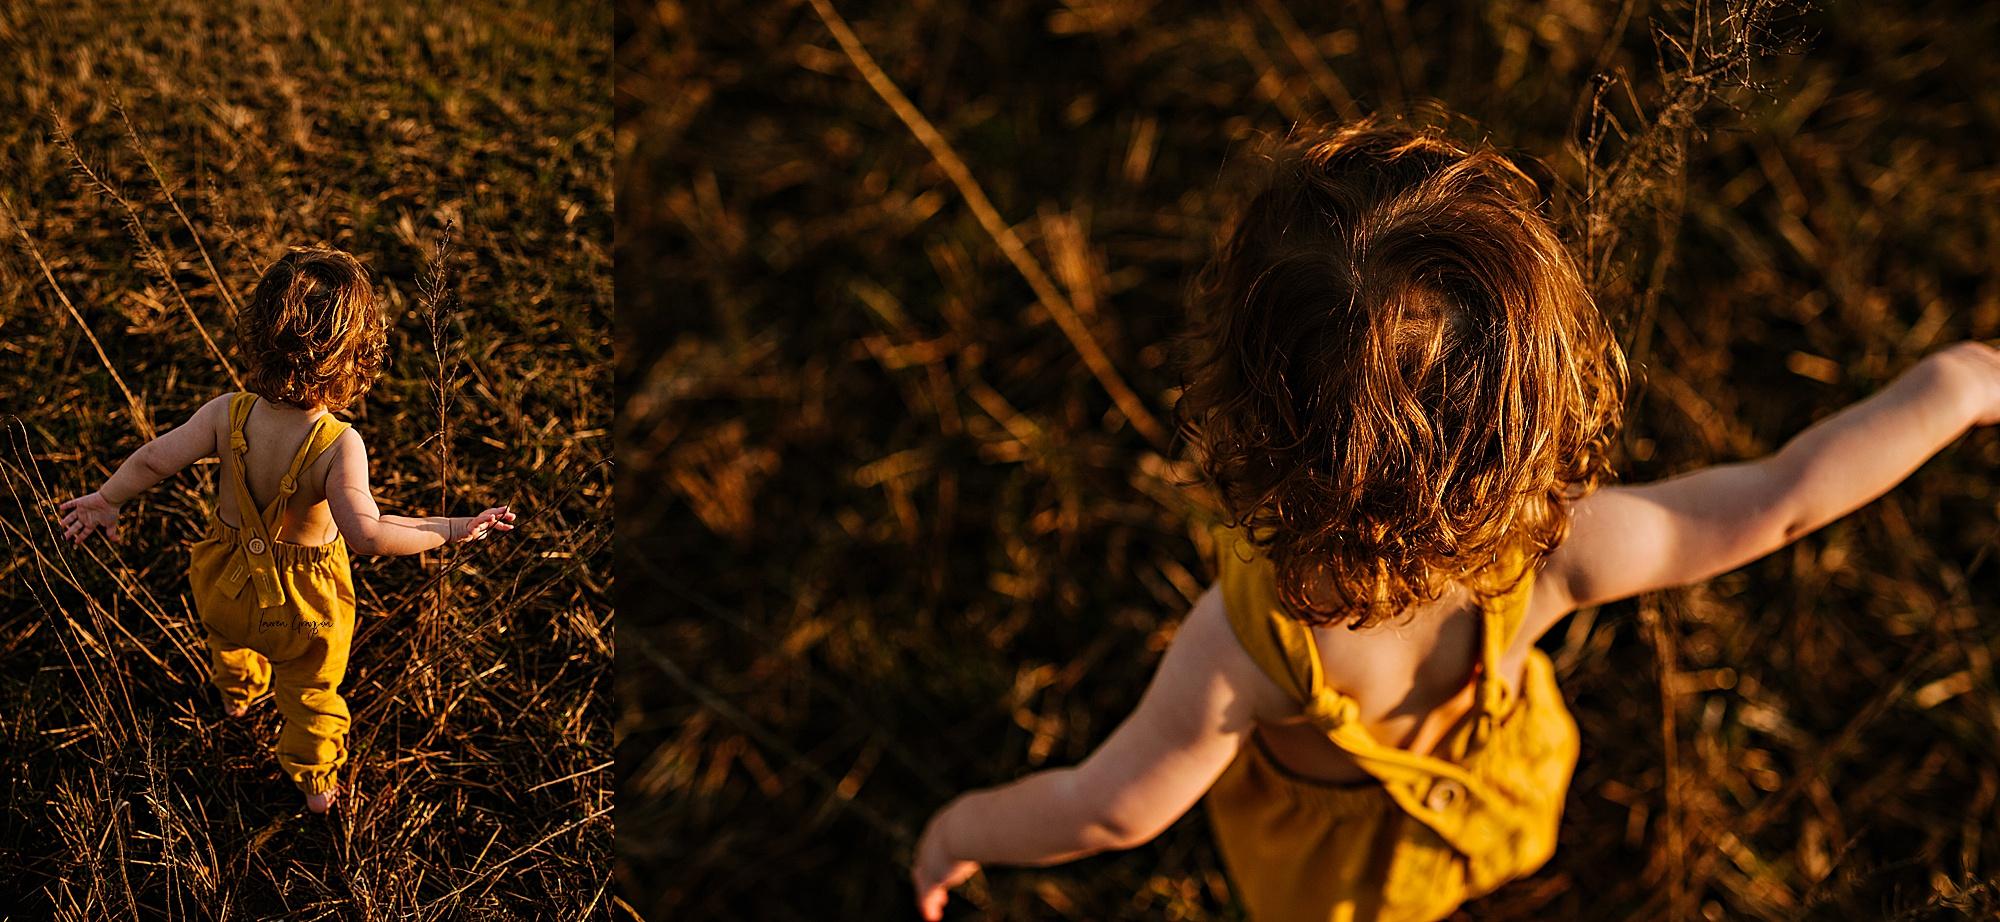 lauren-grayson-photography-akron-ohio-family-mom-boys-field-spring-outdoor-session_0023.jpg